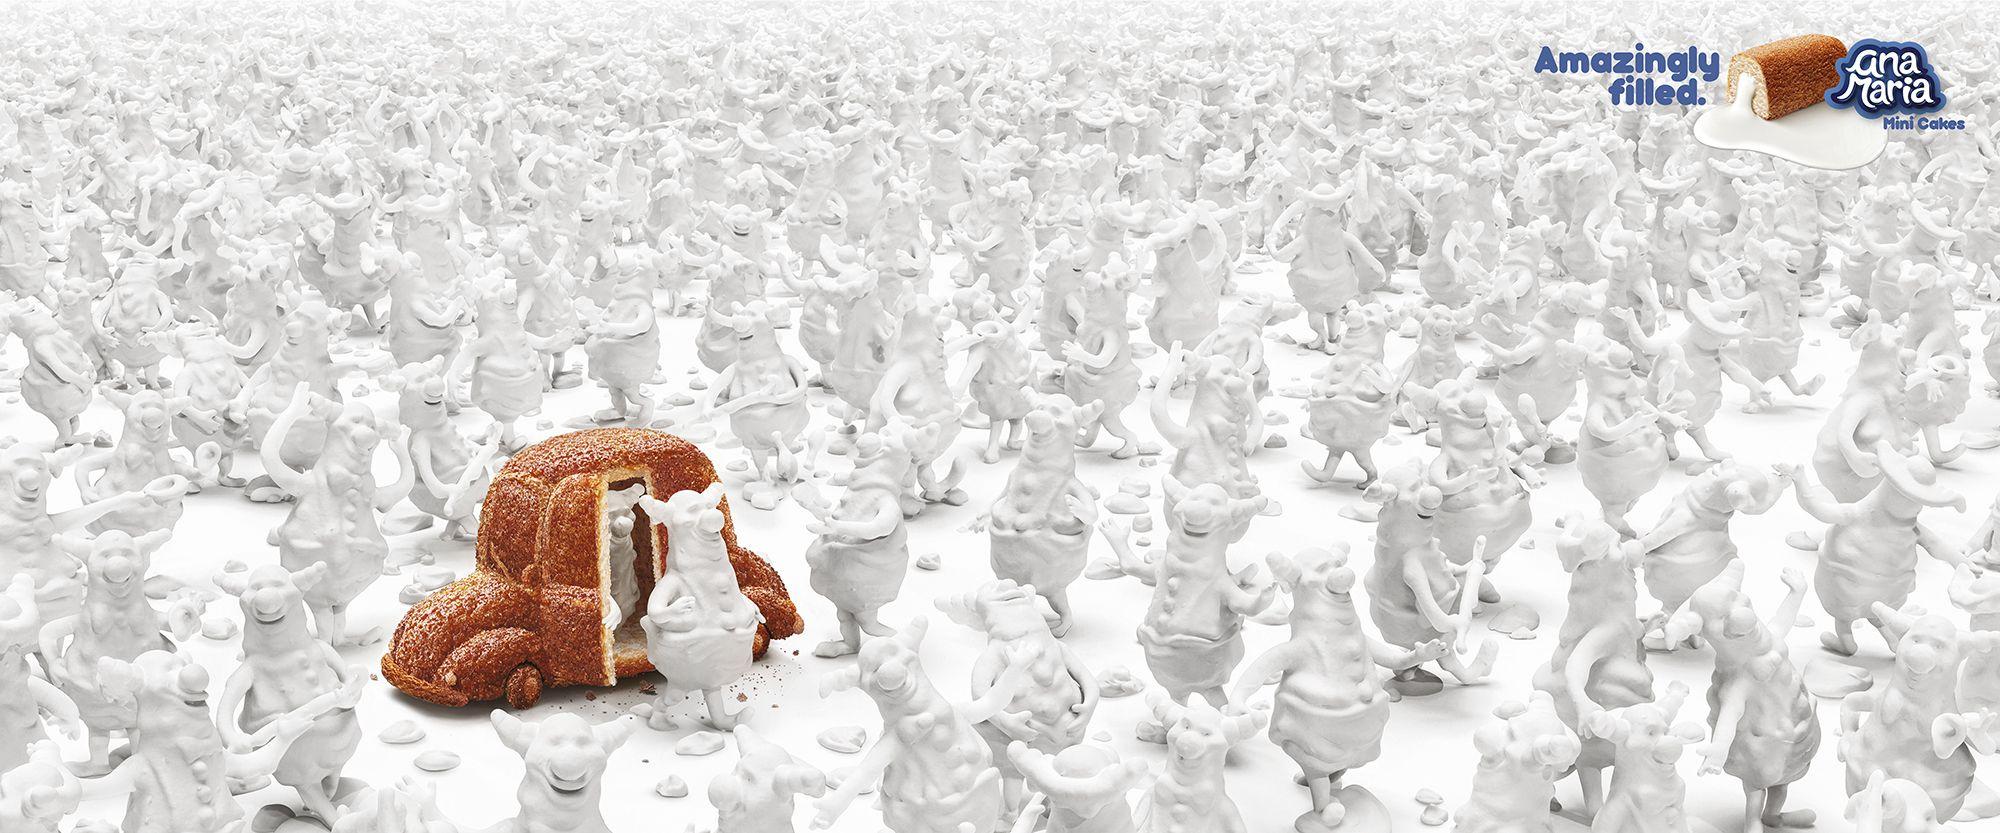 Adeevee - Bimbo Ana Maria: Amazingly Filled Advertising Agency:Africa, São Paulo, Brazil Creative Director:Sergio Gordilho, Rafael Pitanguy, Humberto Fernandez Art Director:Erico Braga, Humberto Fernandez, Gabriel Jardim Copywriter:Pedro Bullos, Ricardo Franco, Guilherme Aché Illustrator:Davila Studio